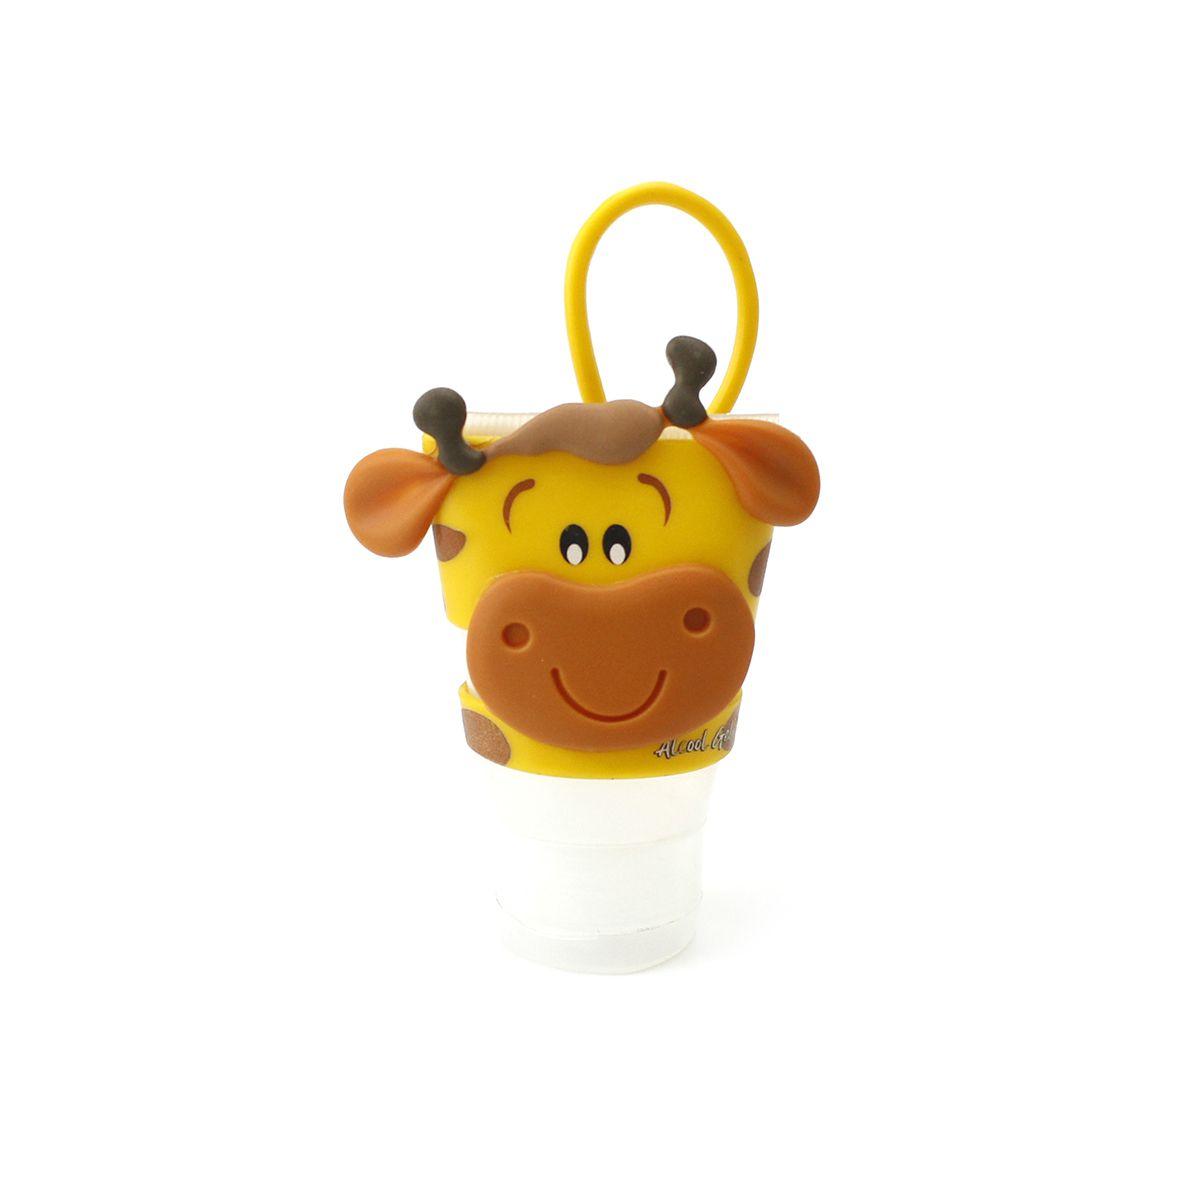 Chaveiro Plugt Girafa Amarelo + Frasco 30ml